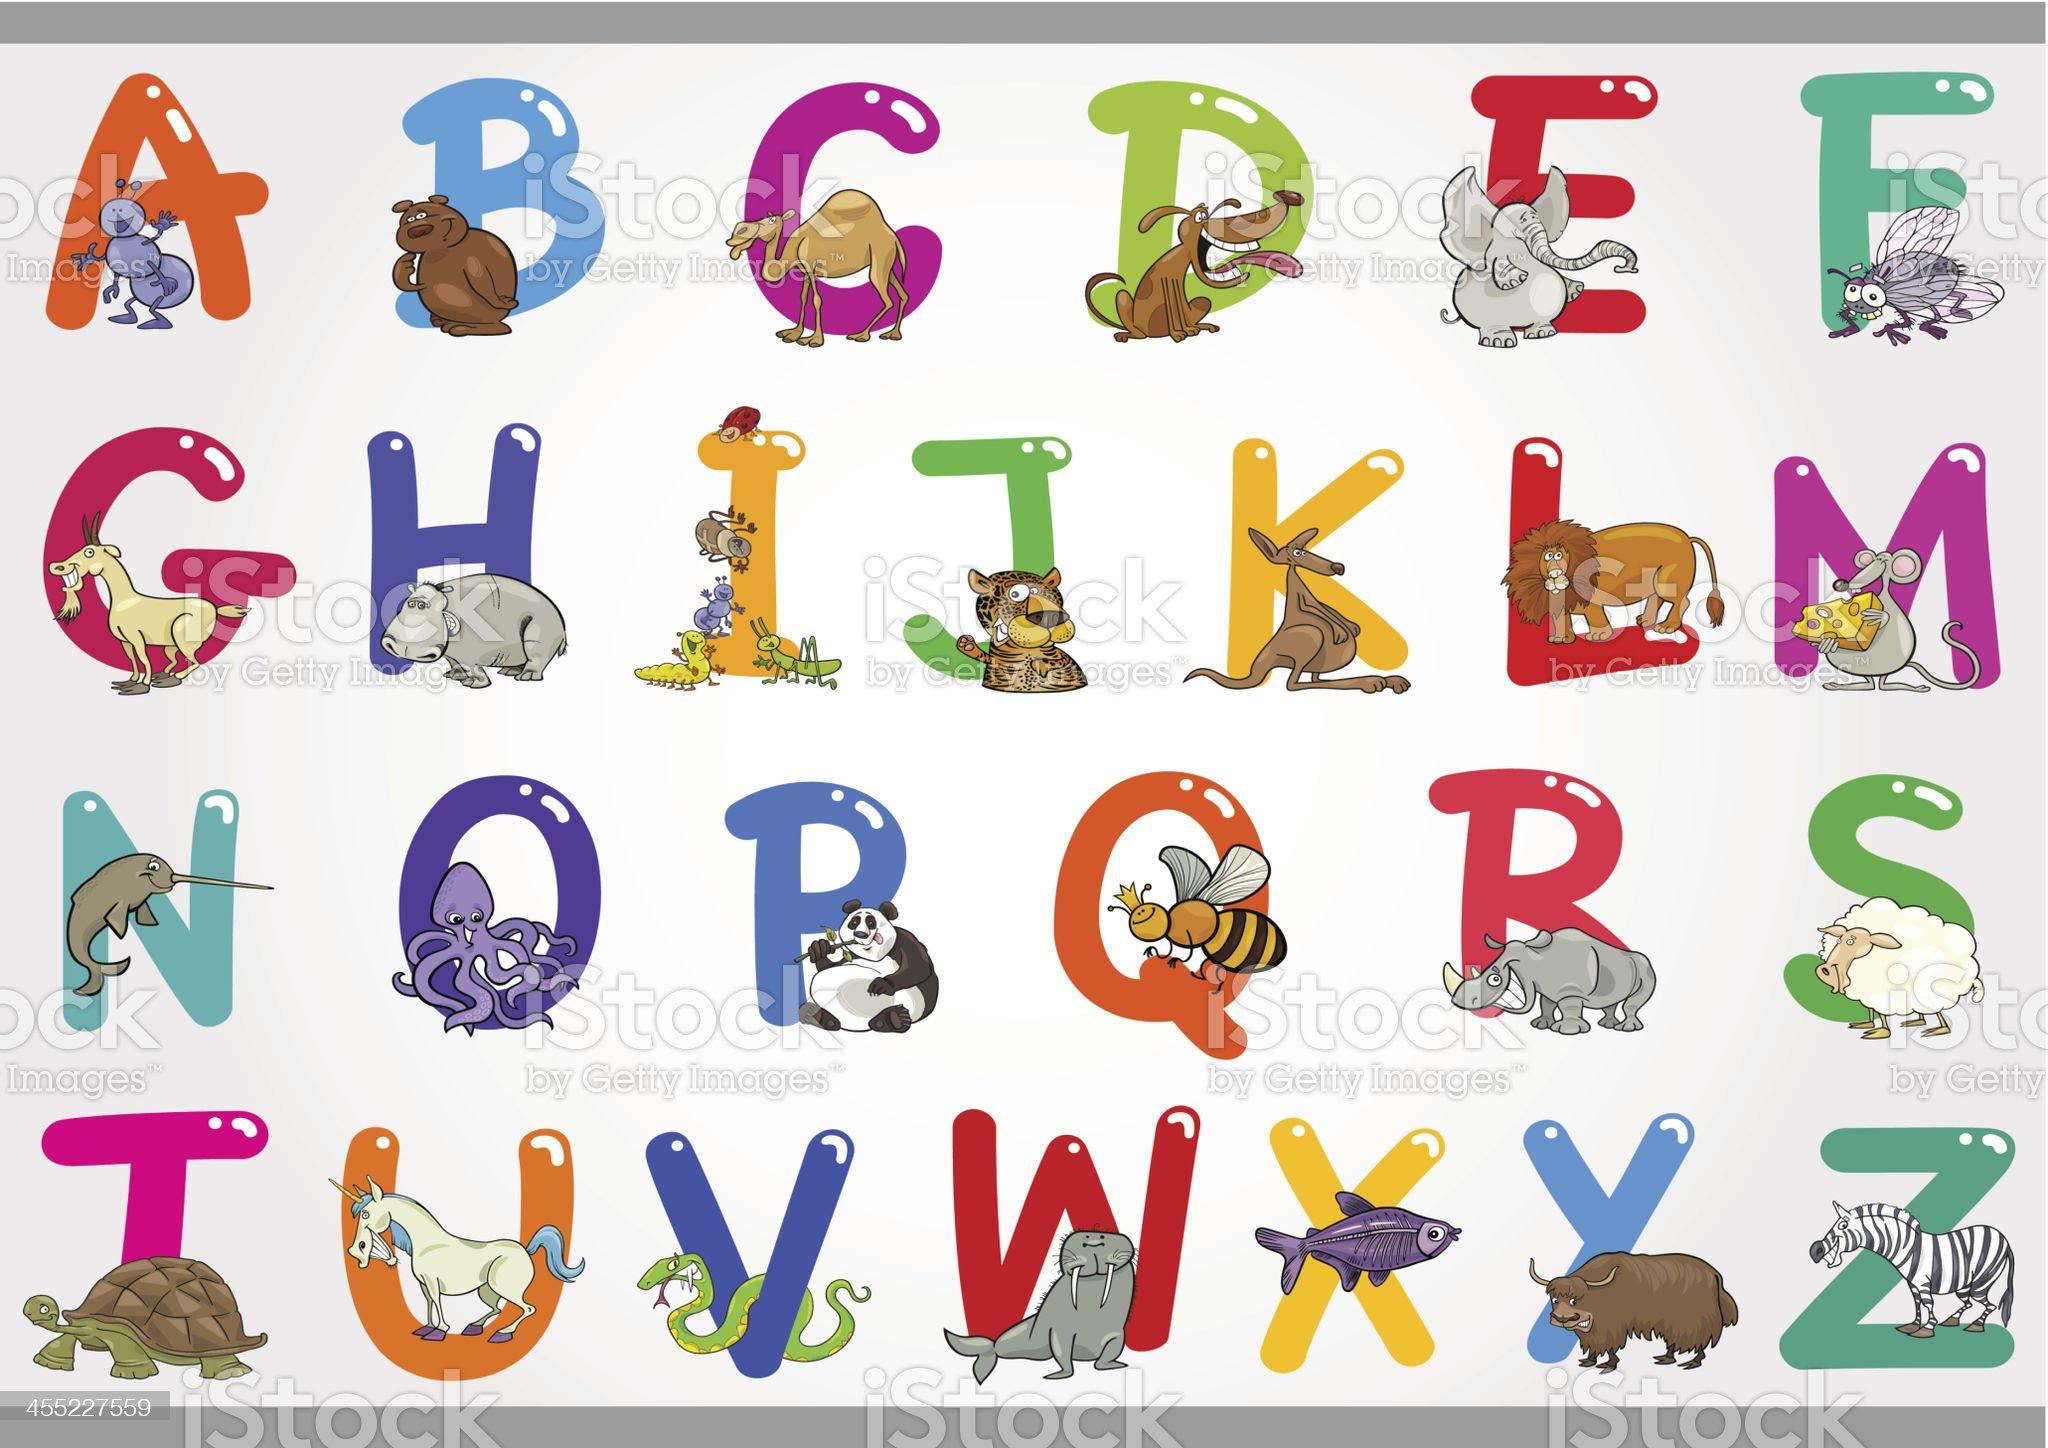 Cartoon Alphabet with Animals Illustrations royalty-free stock vector art